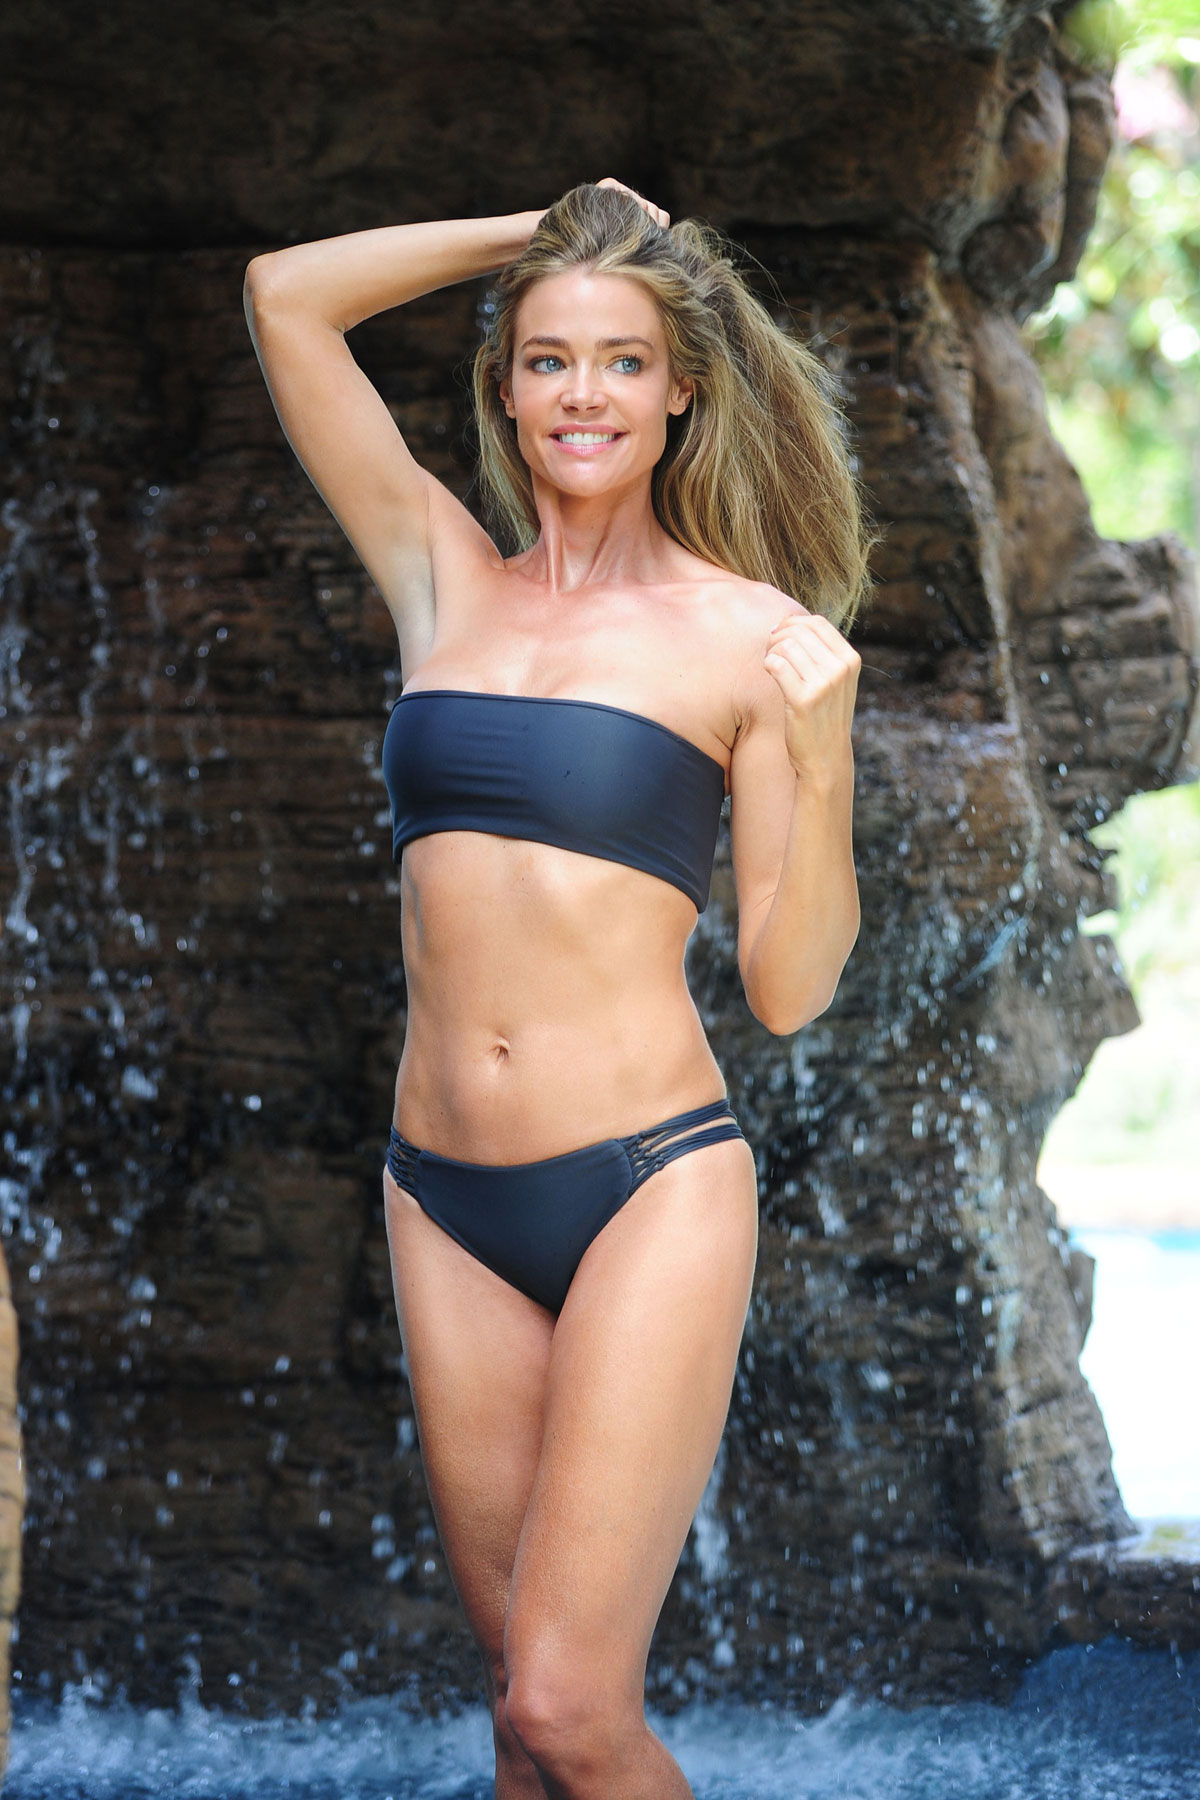 Bikini Denise Capezza naked (59 photo), Sexy, Hot, Selfie, butt 2006